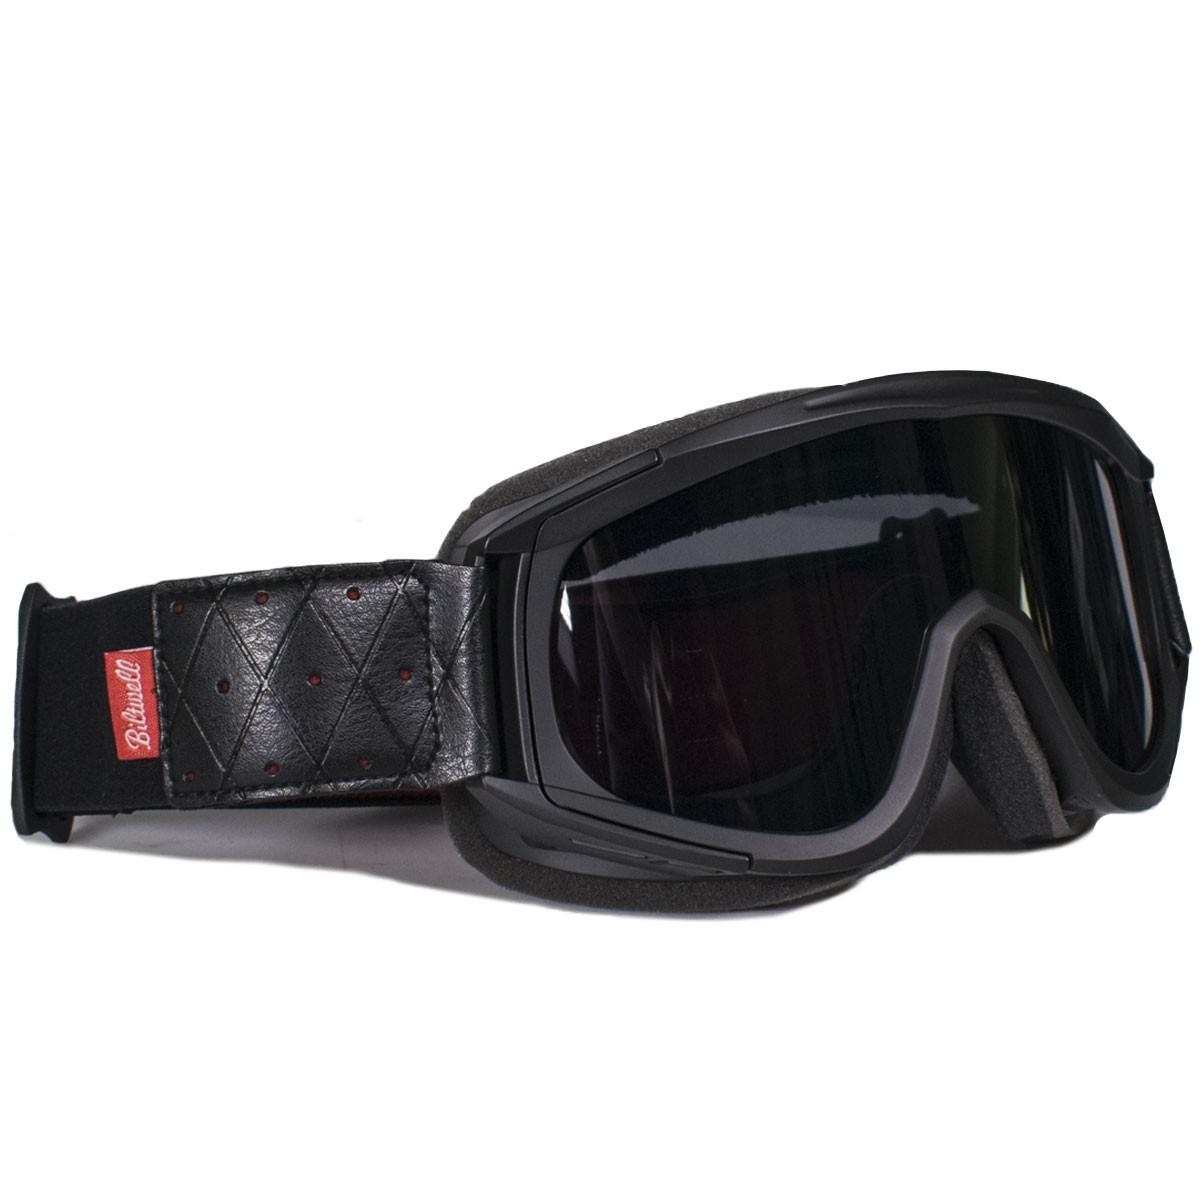 Biltwell Overland Goggles 2 - Biltwell Overland Goggles